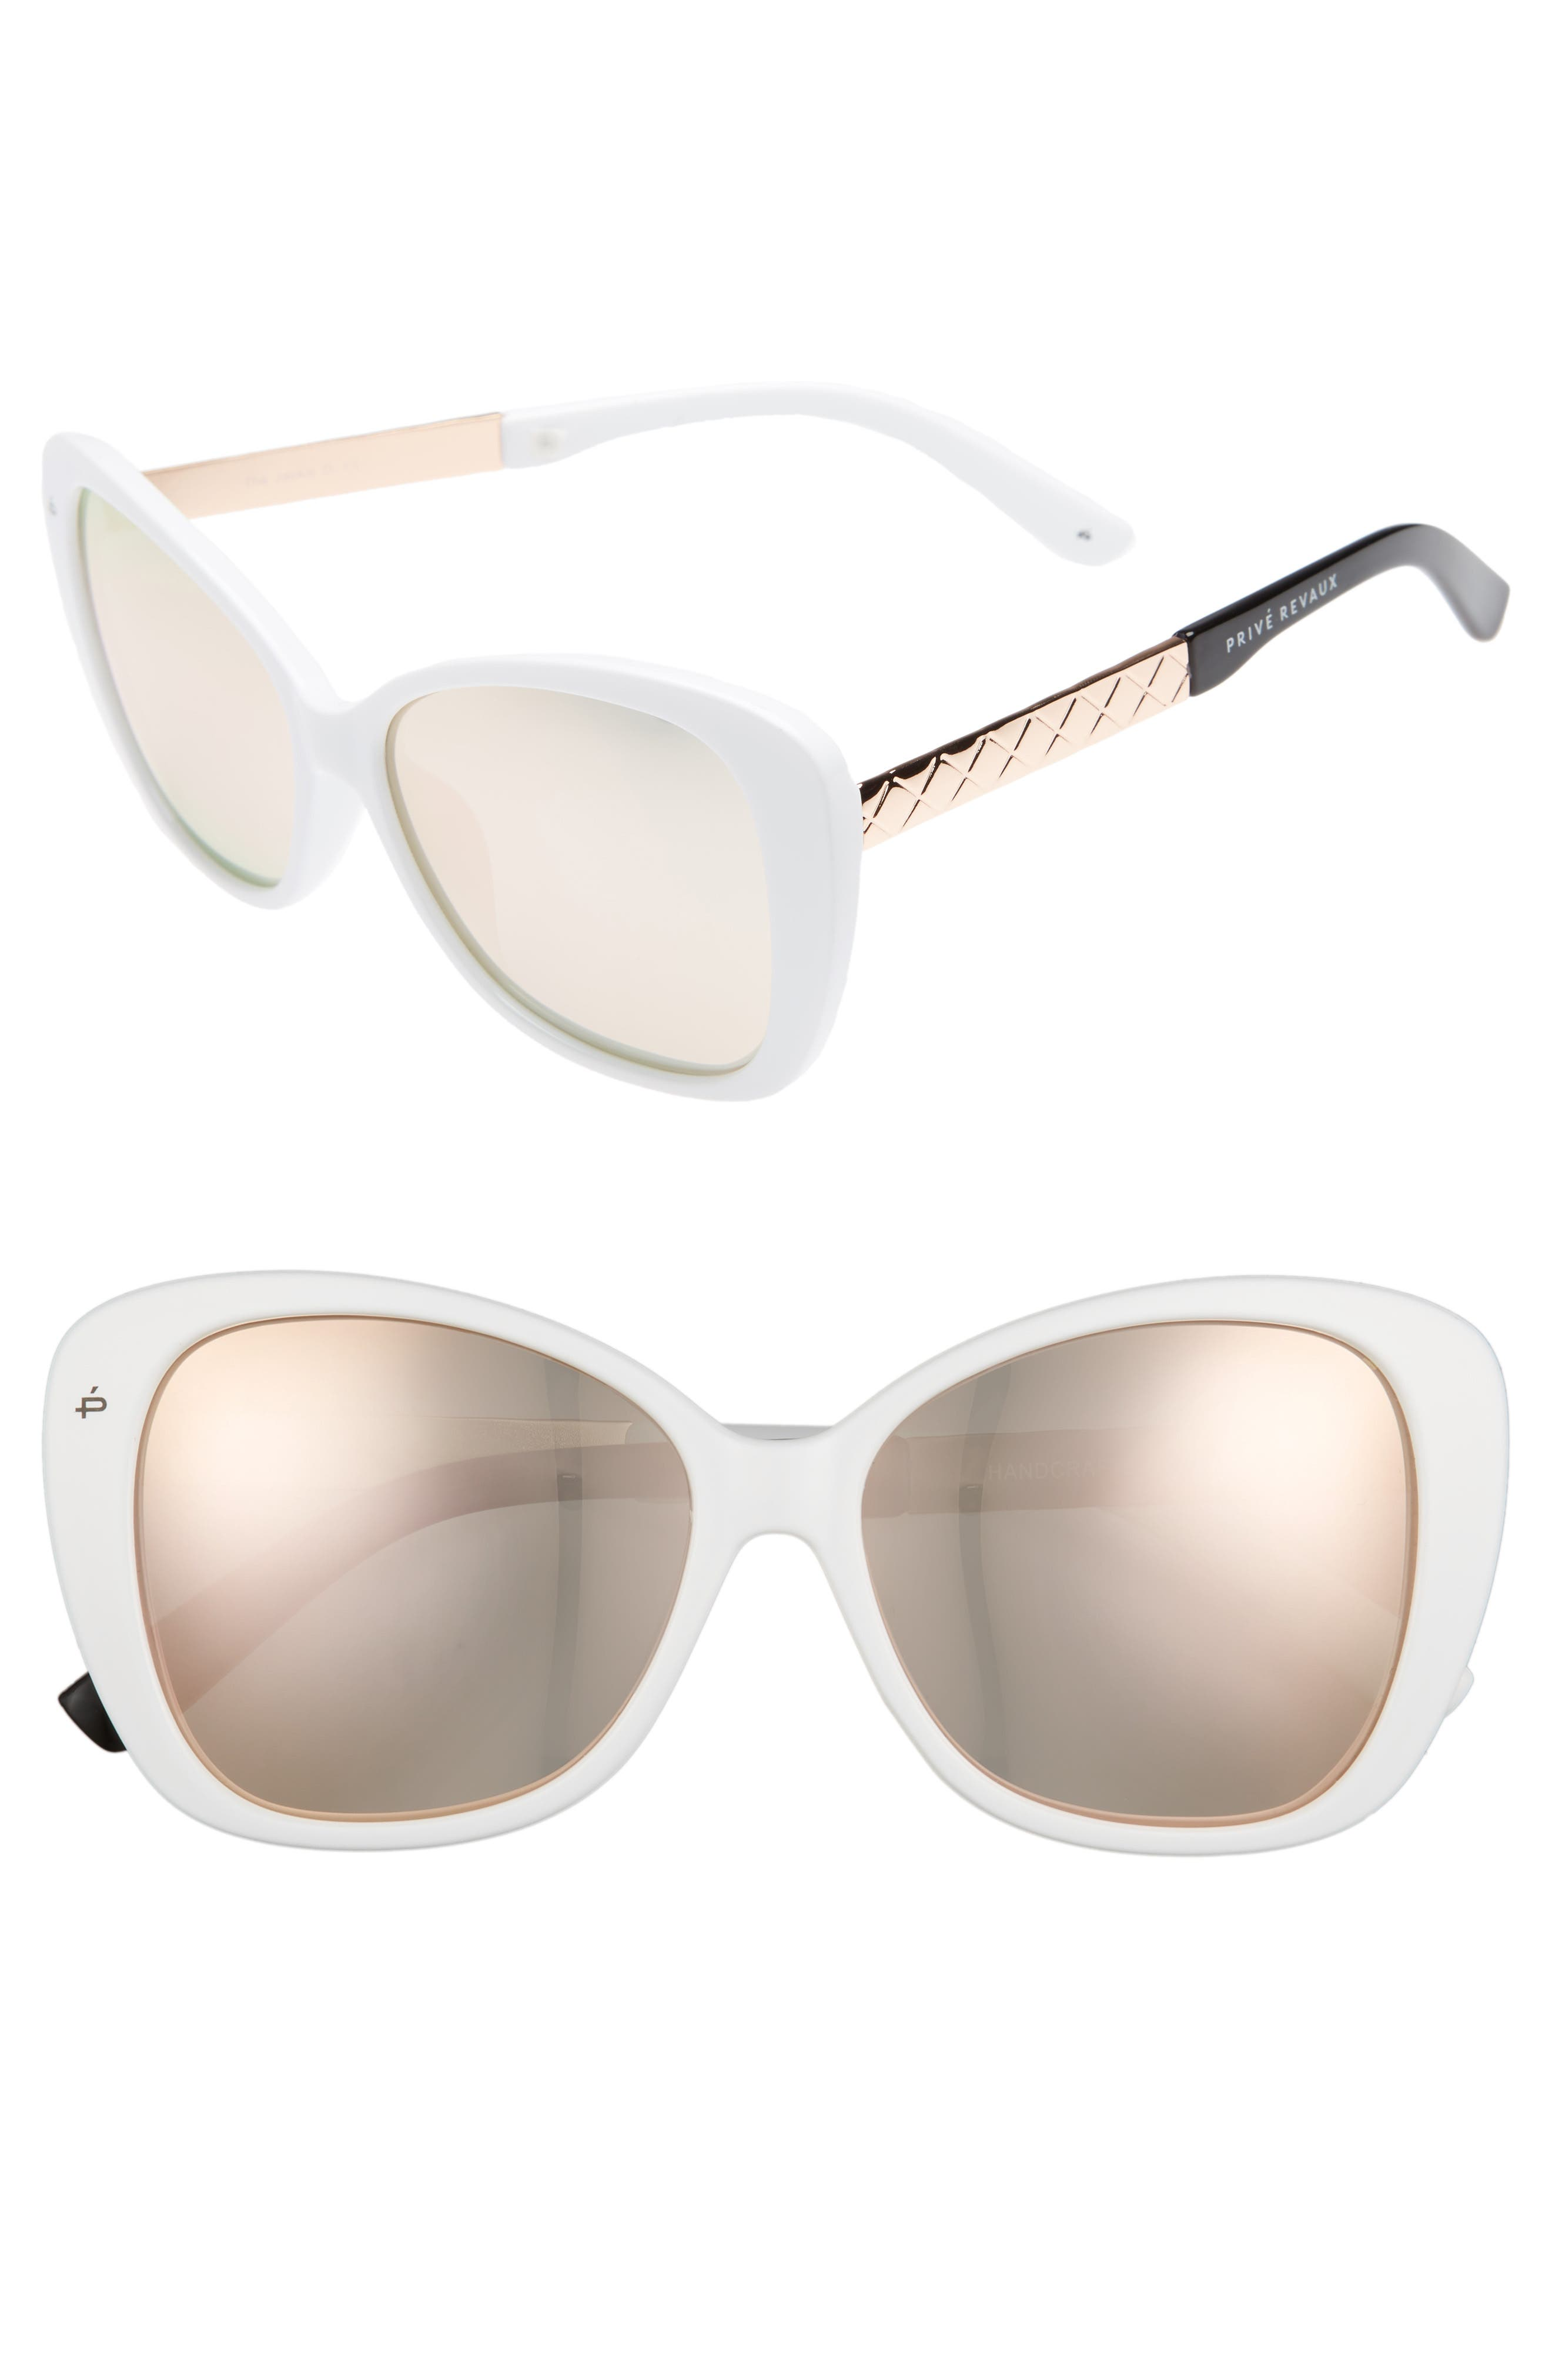 Privé Revaux The Jackie O 56mm Cat Eye Sunglasses,                         Main,                         color, White Polarized